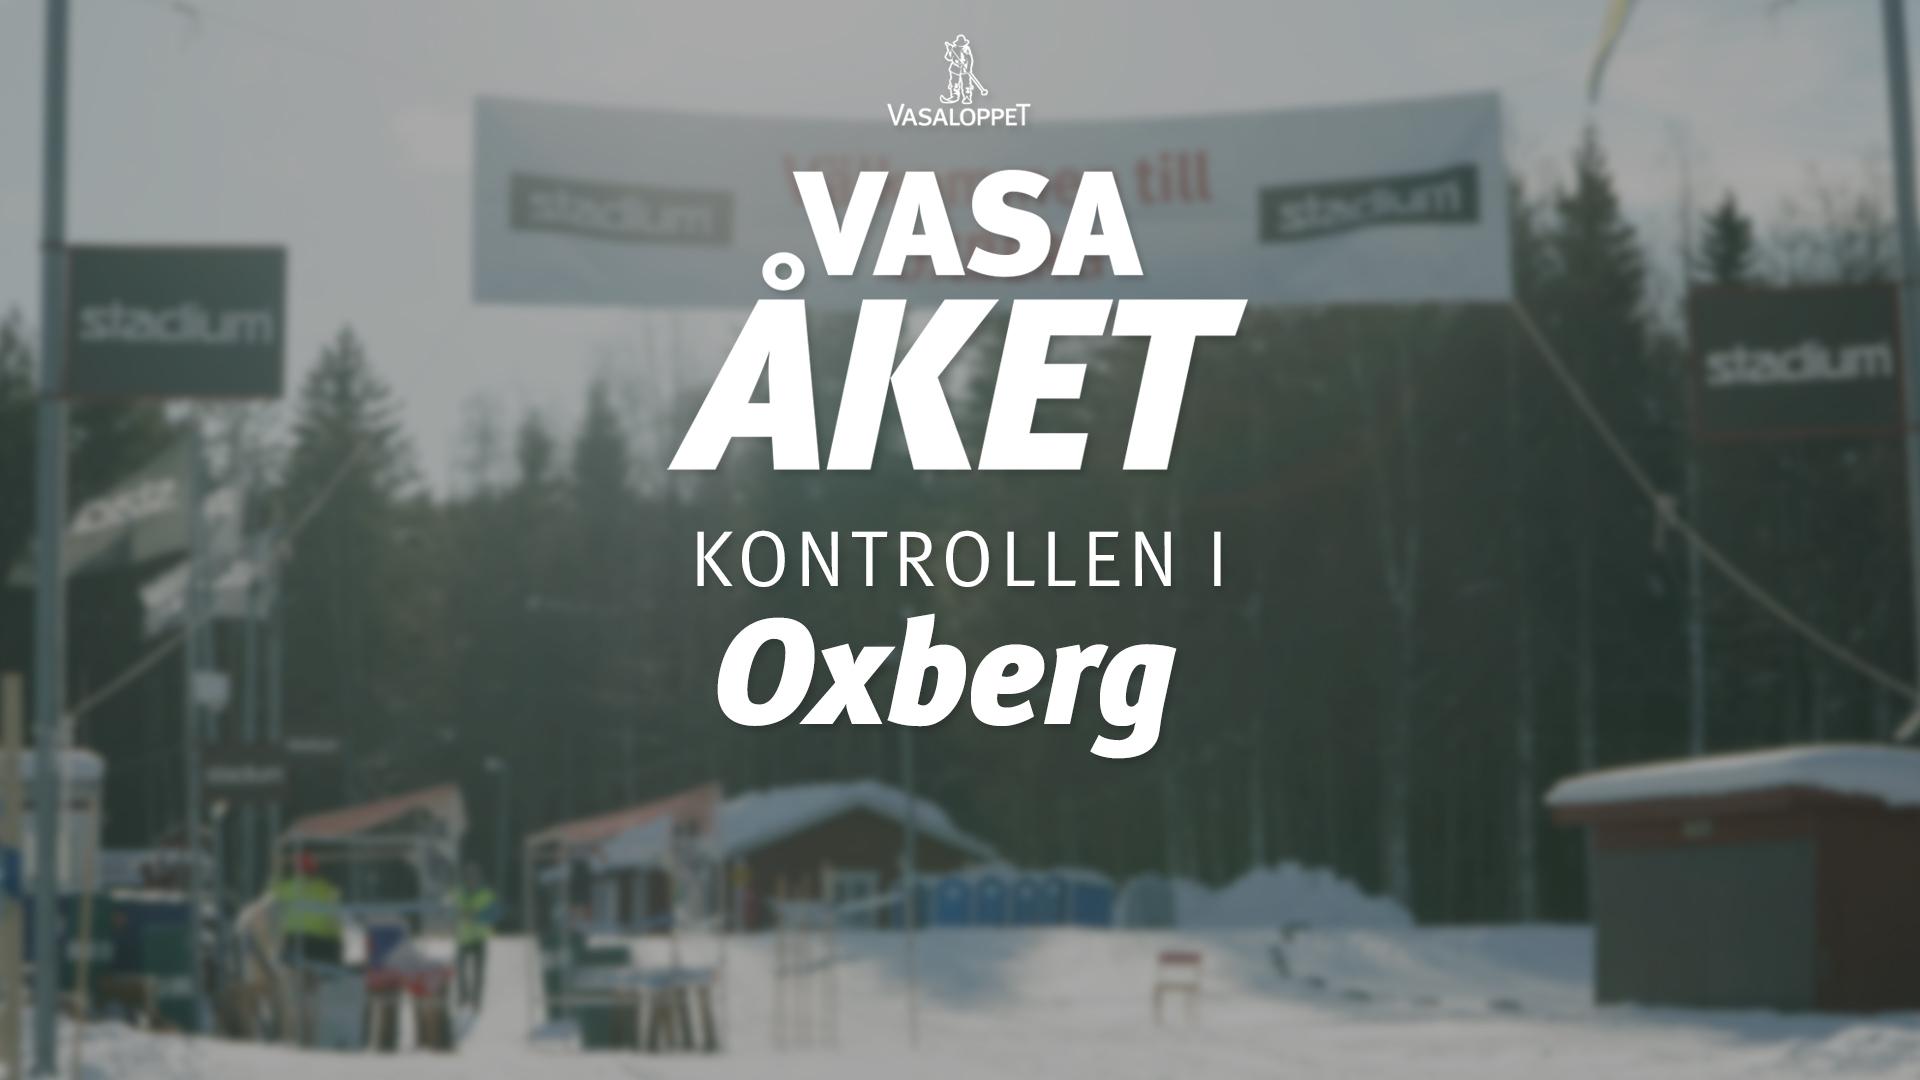 6 mars, 2021 – Oxberg